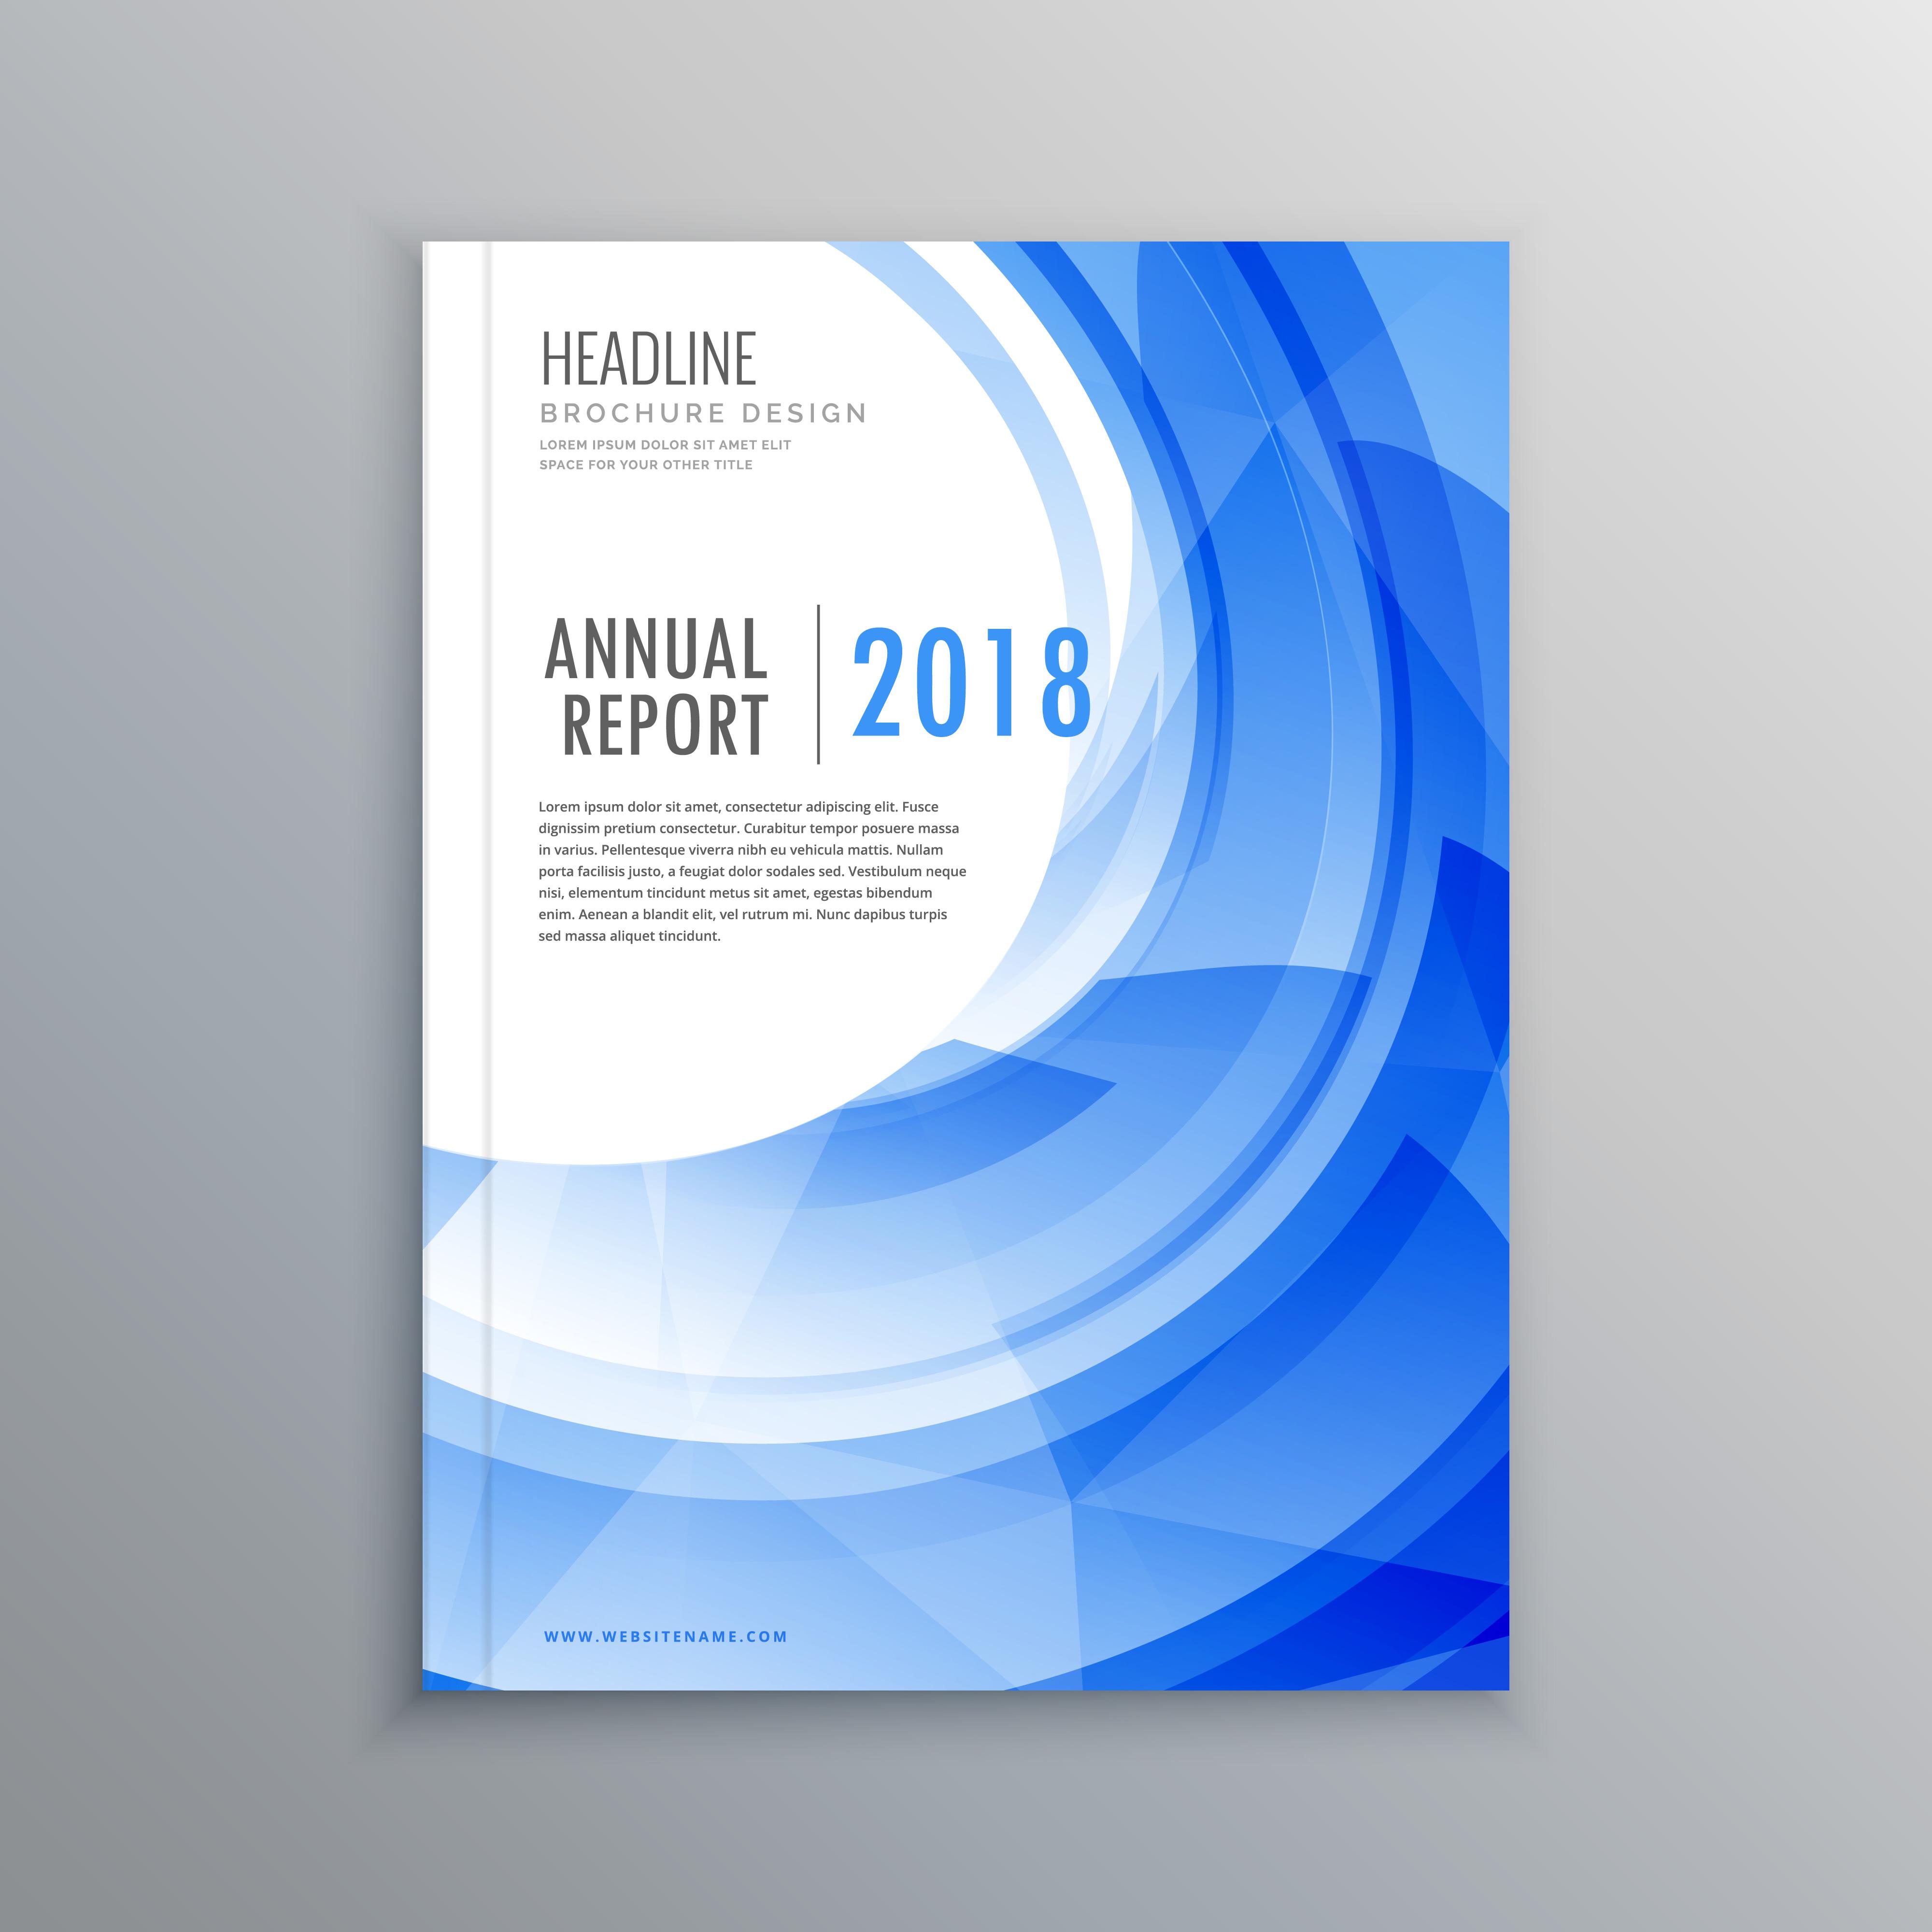 amazing brochure designs - amazing brochure flyer design template with blue wave